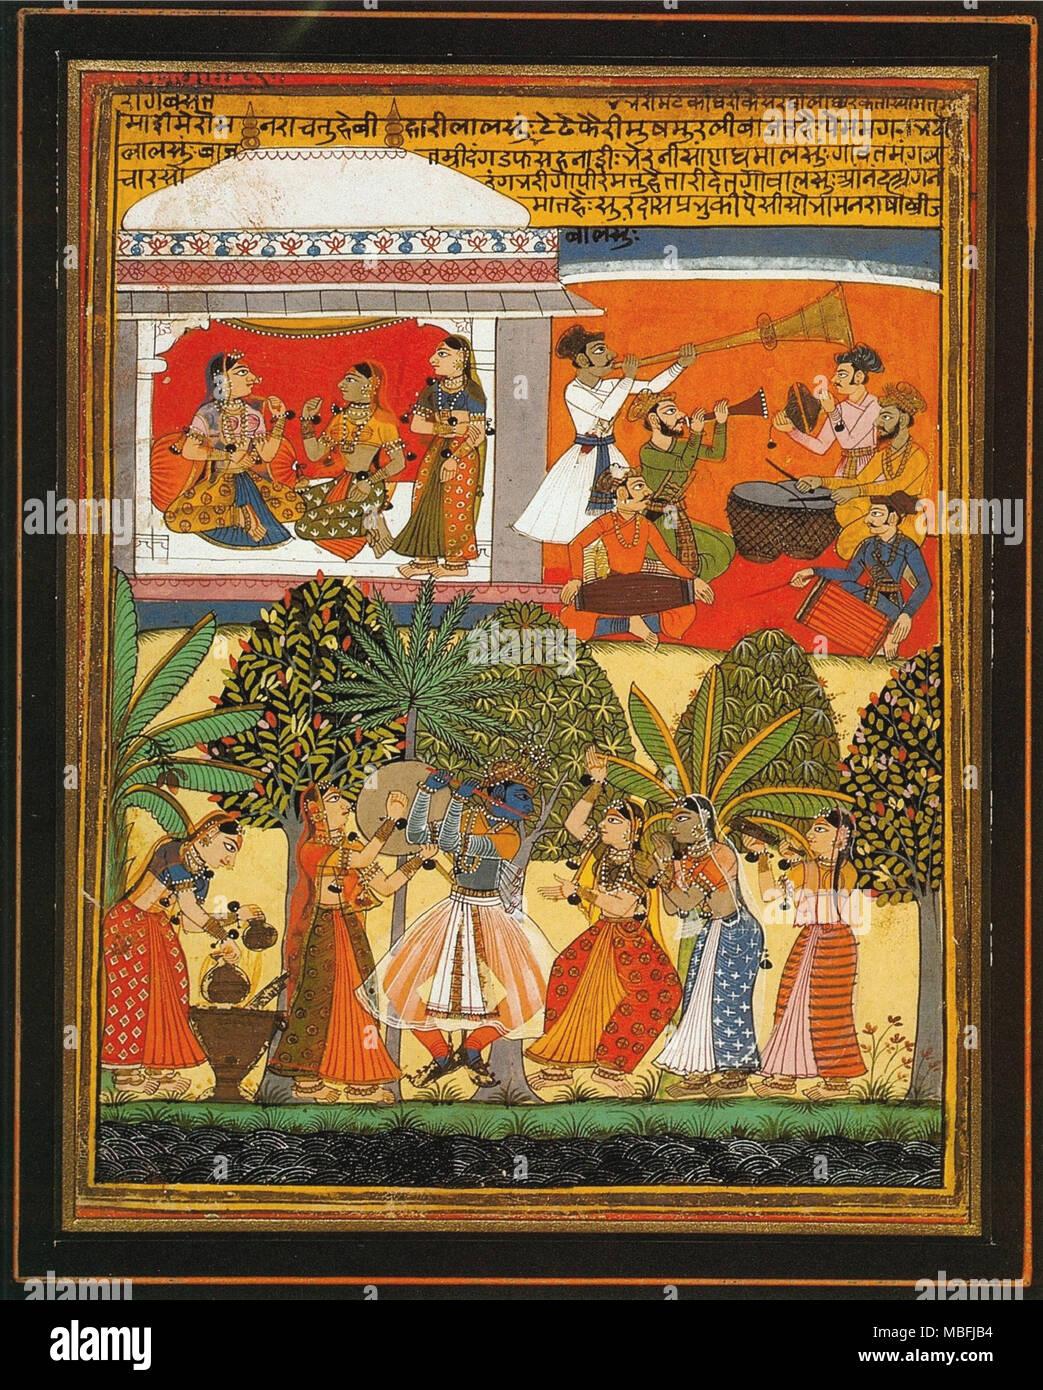 Krishna Dances with the Gopis - Stock Image